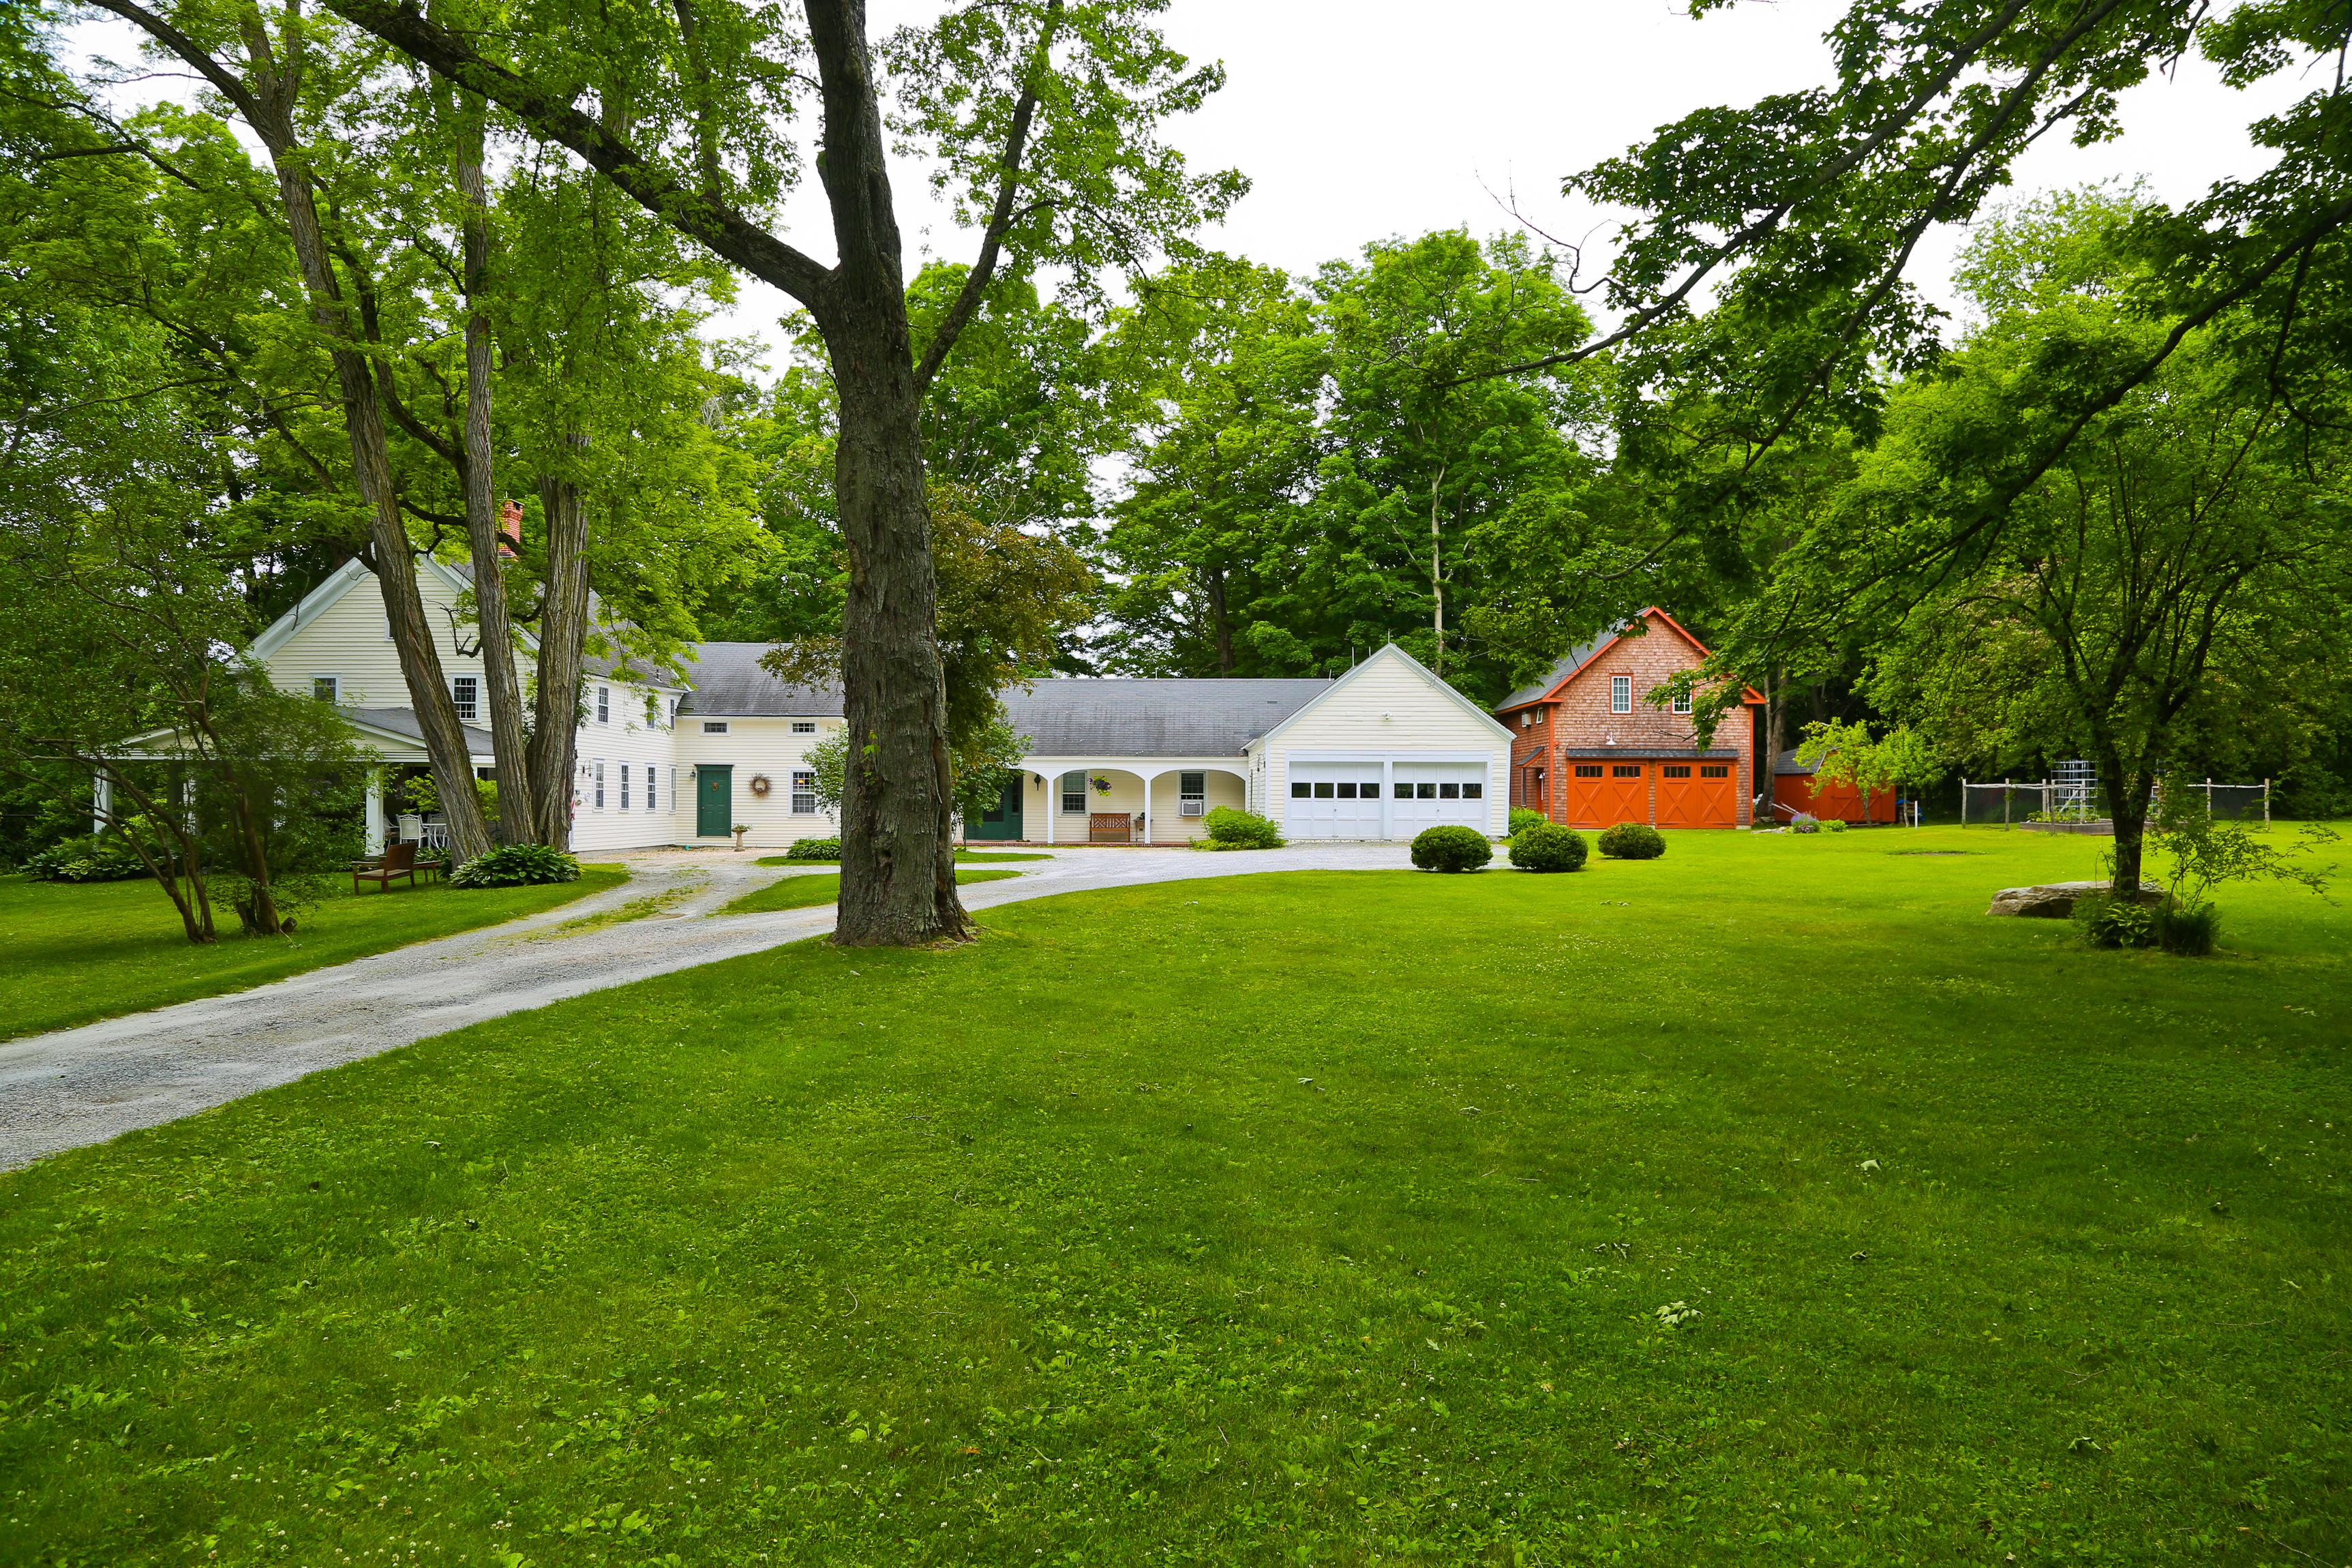 独户住宅 为 销售 在 Center Chimney Colonial 1 East St 李, 马萨诸塞州, 01238 美国